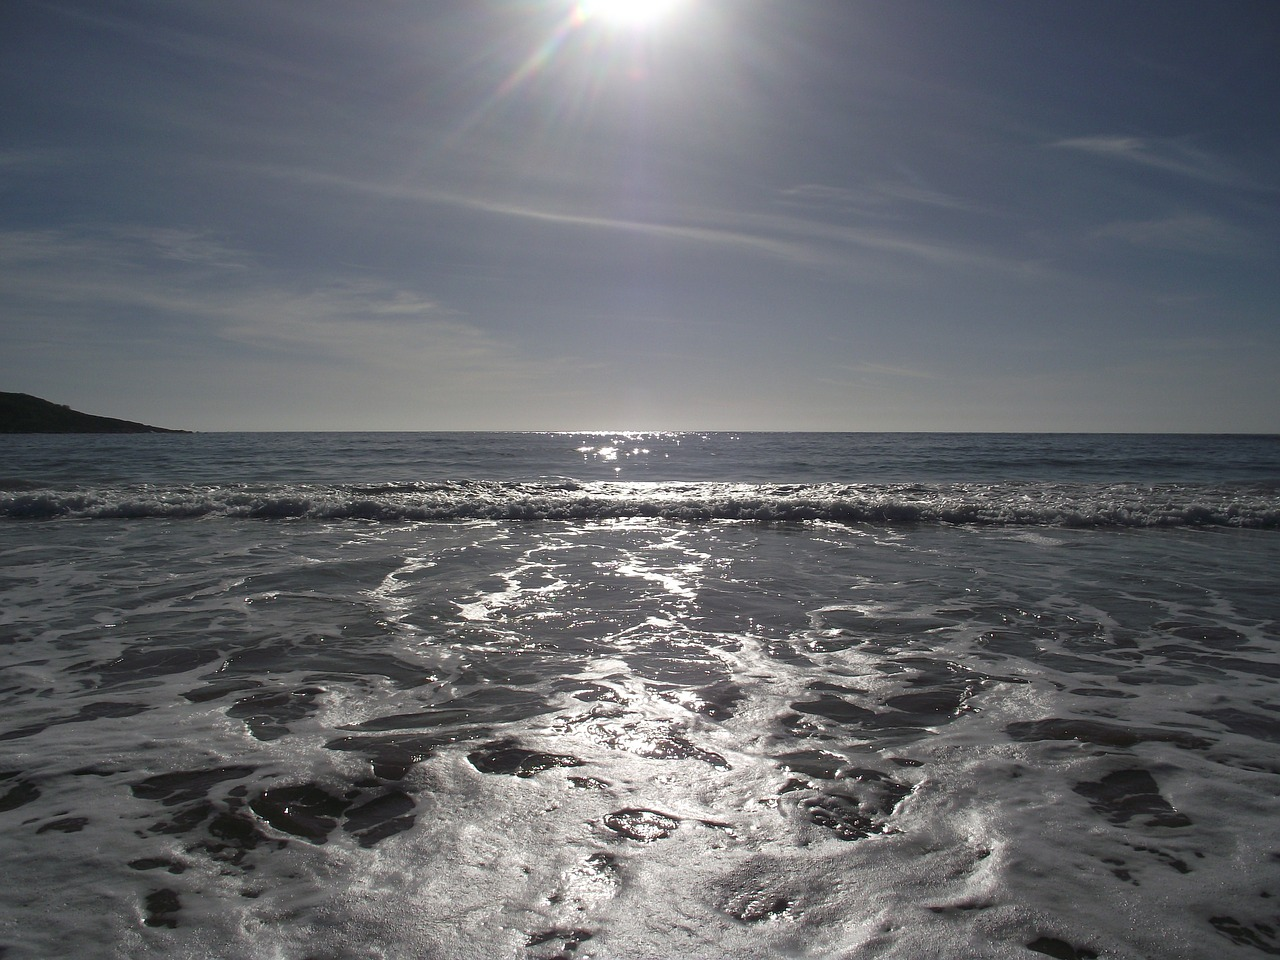 ocean-250222_1280